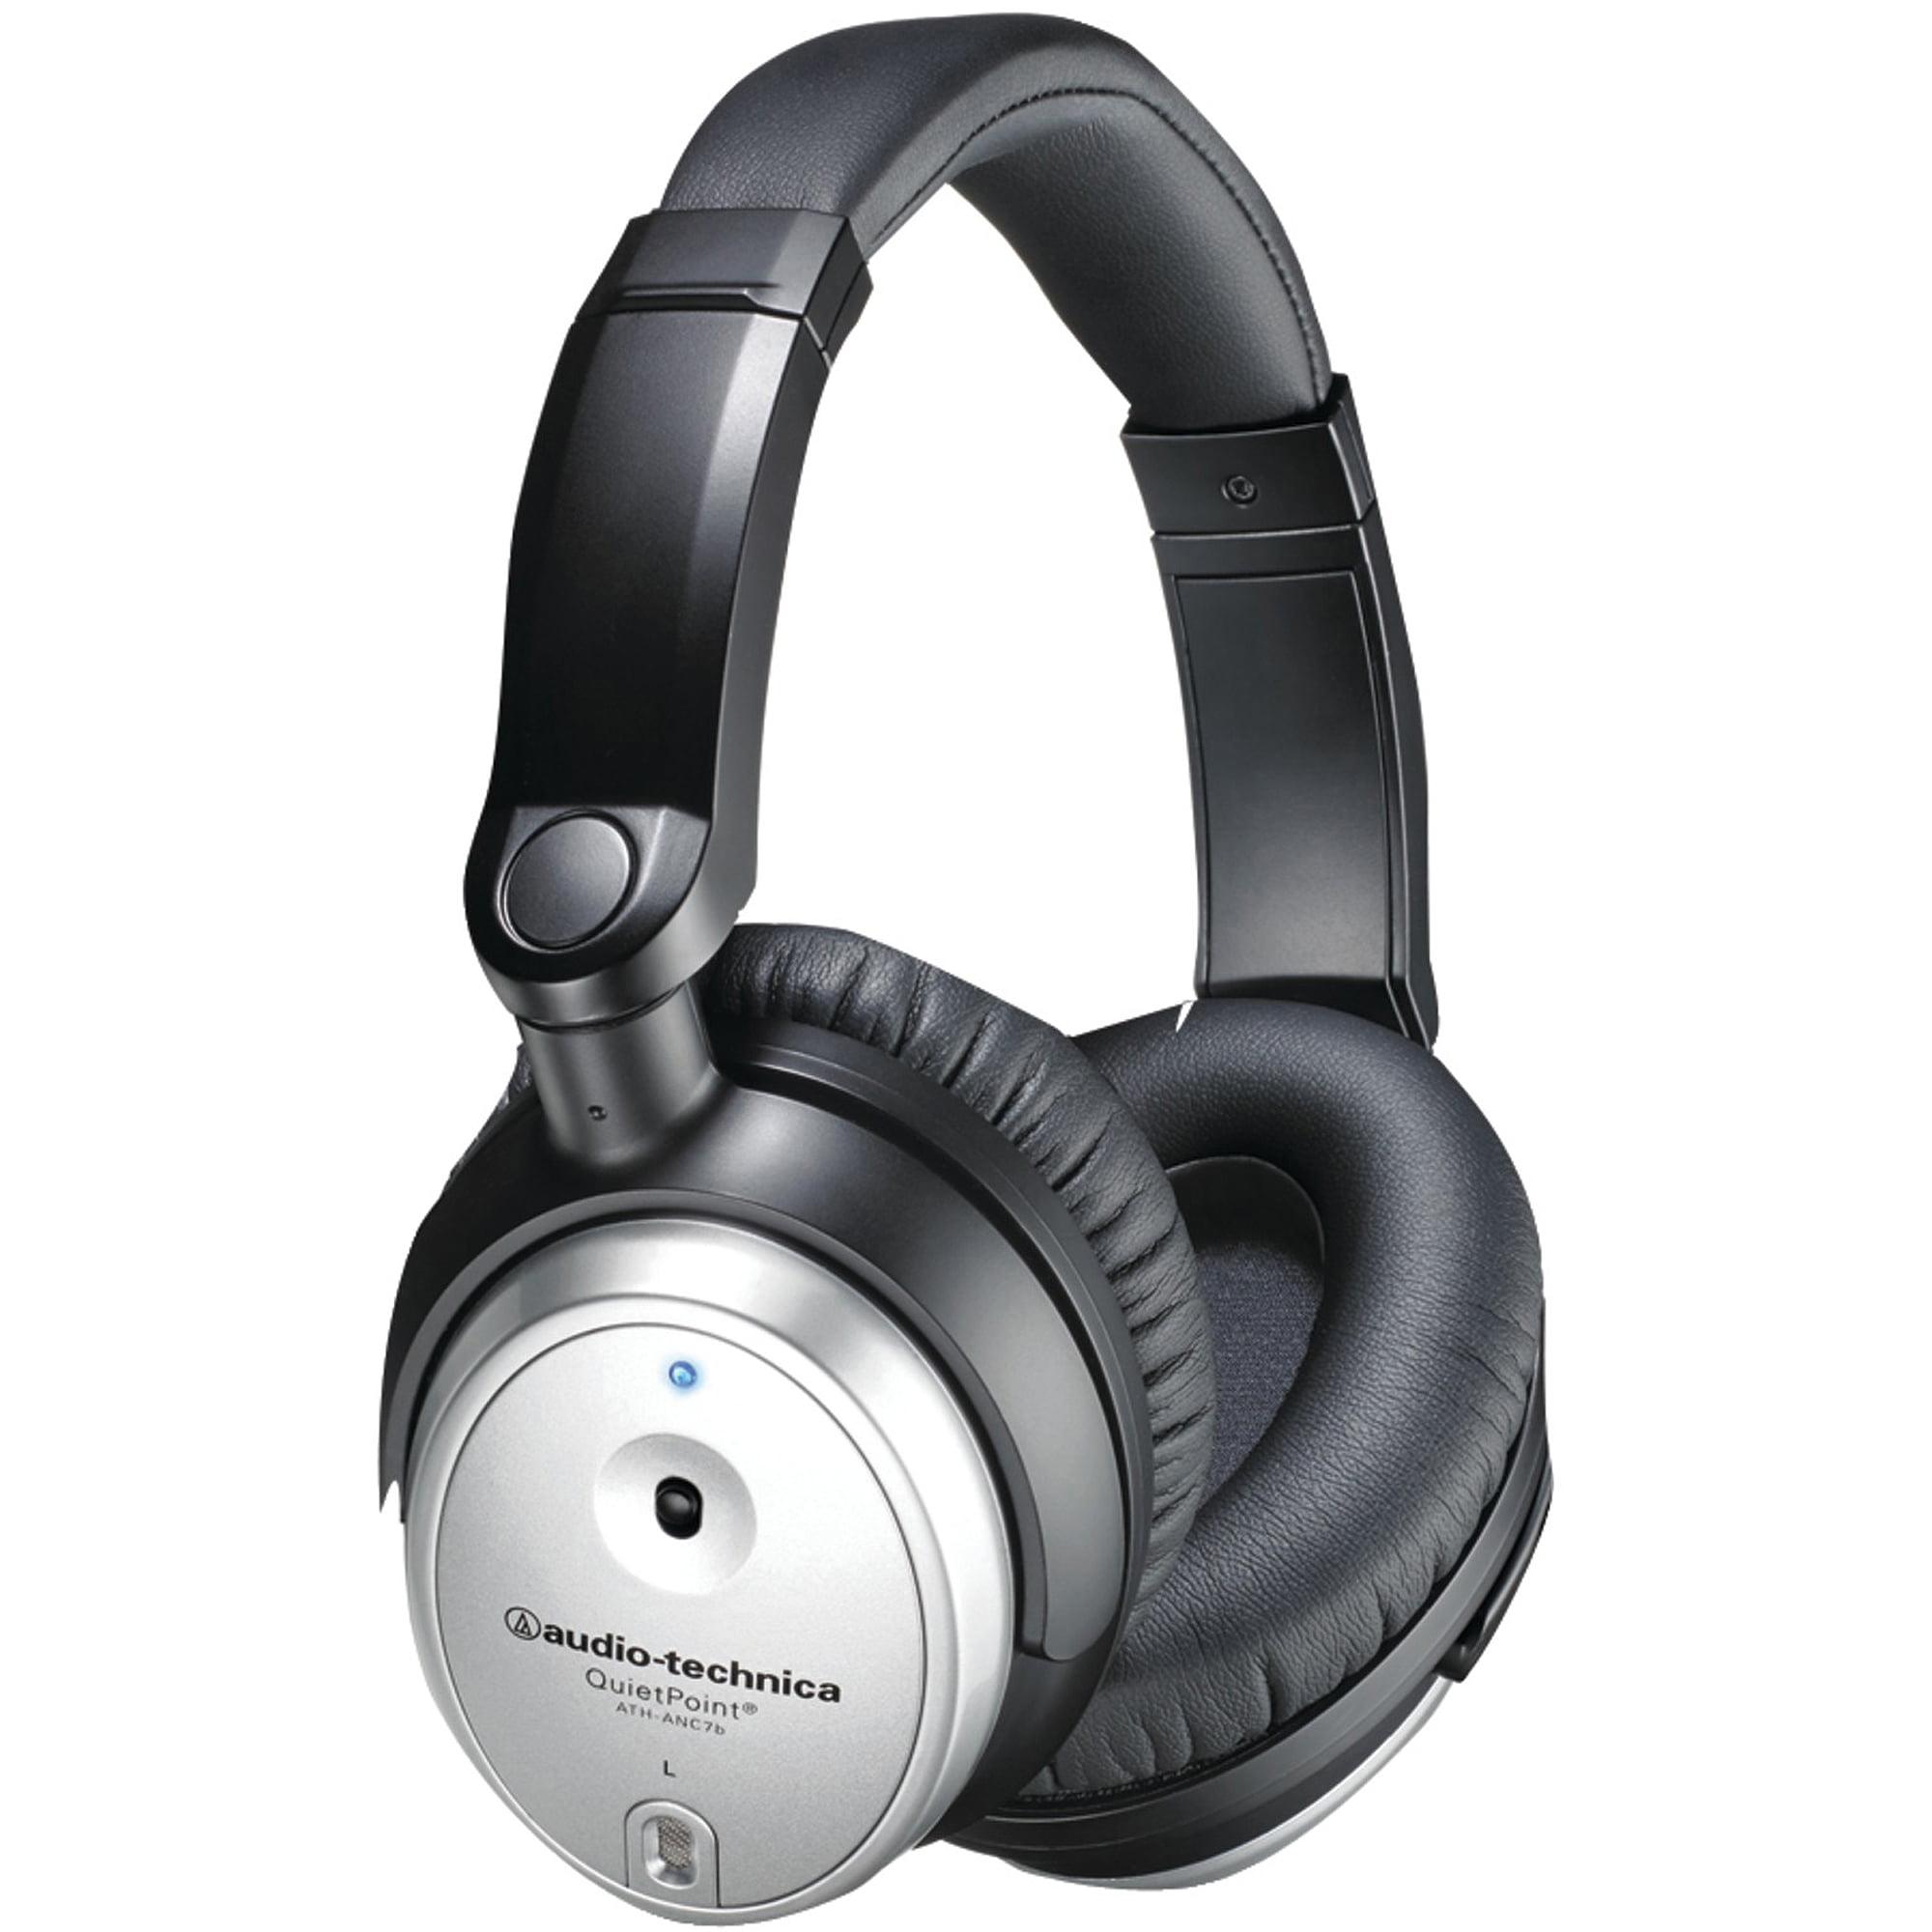 Audio-Technica Active Noise-Cancelling Headphones, ATH-ANC7BSVIS